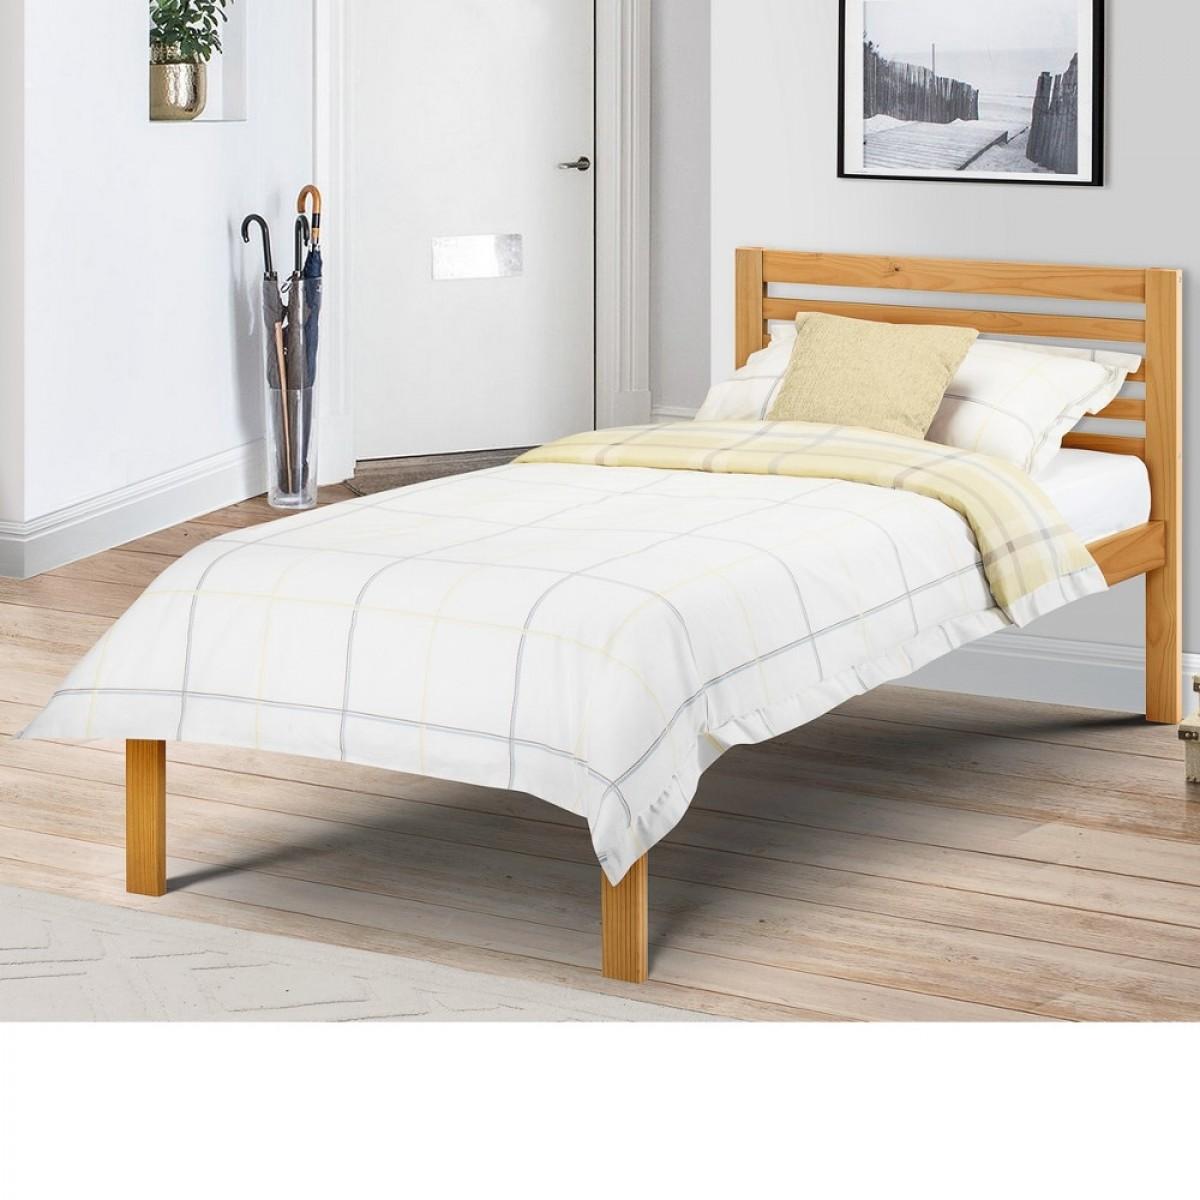 Slocum Antique Solid Pine Wooden Bed